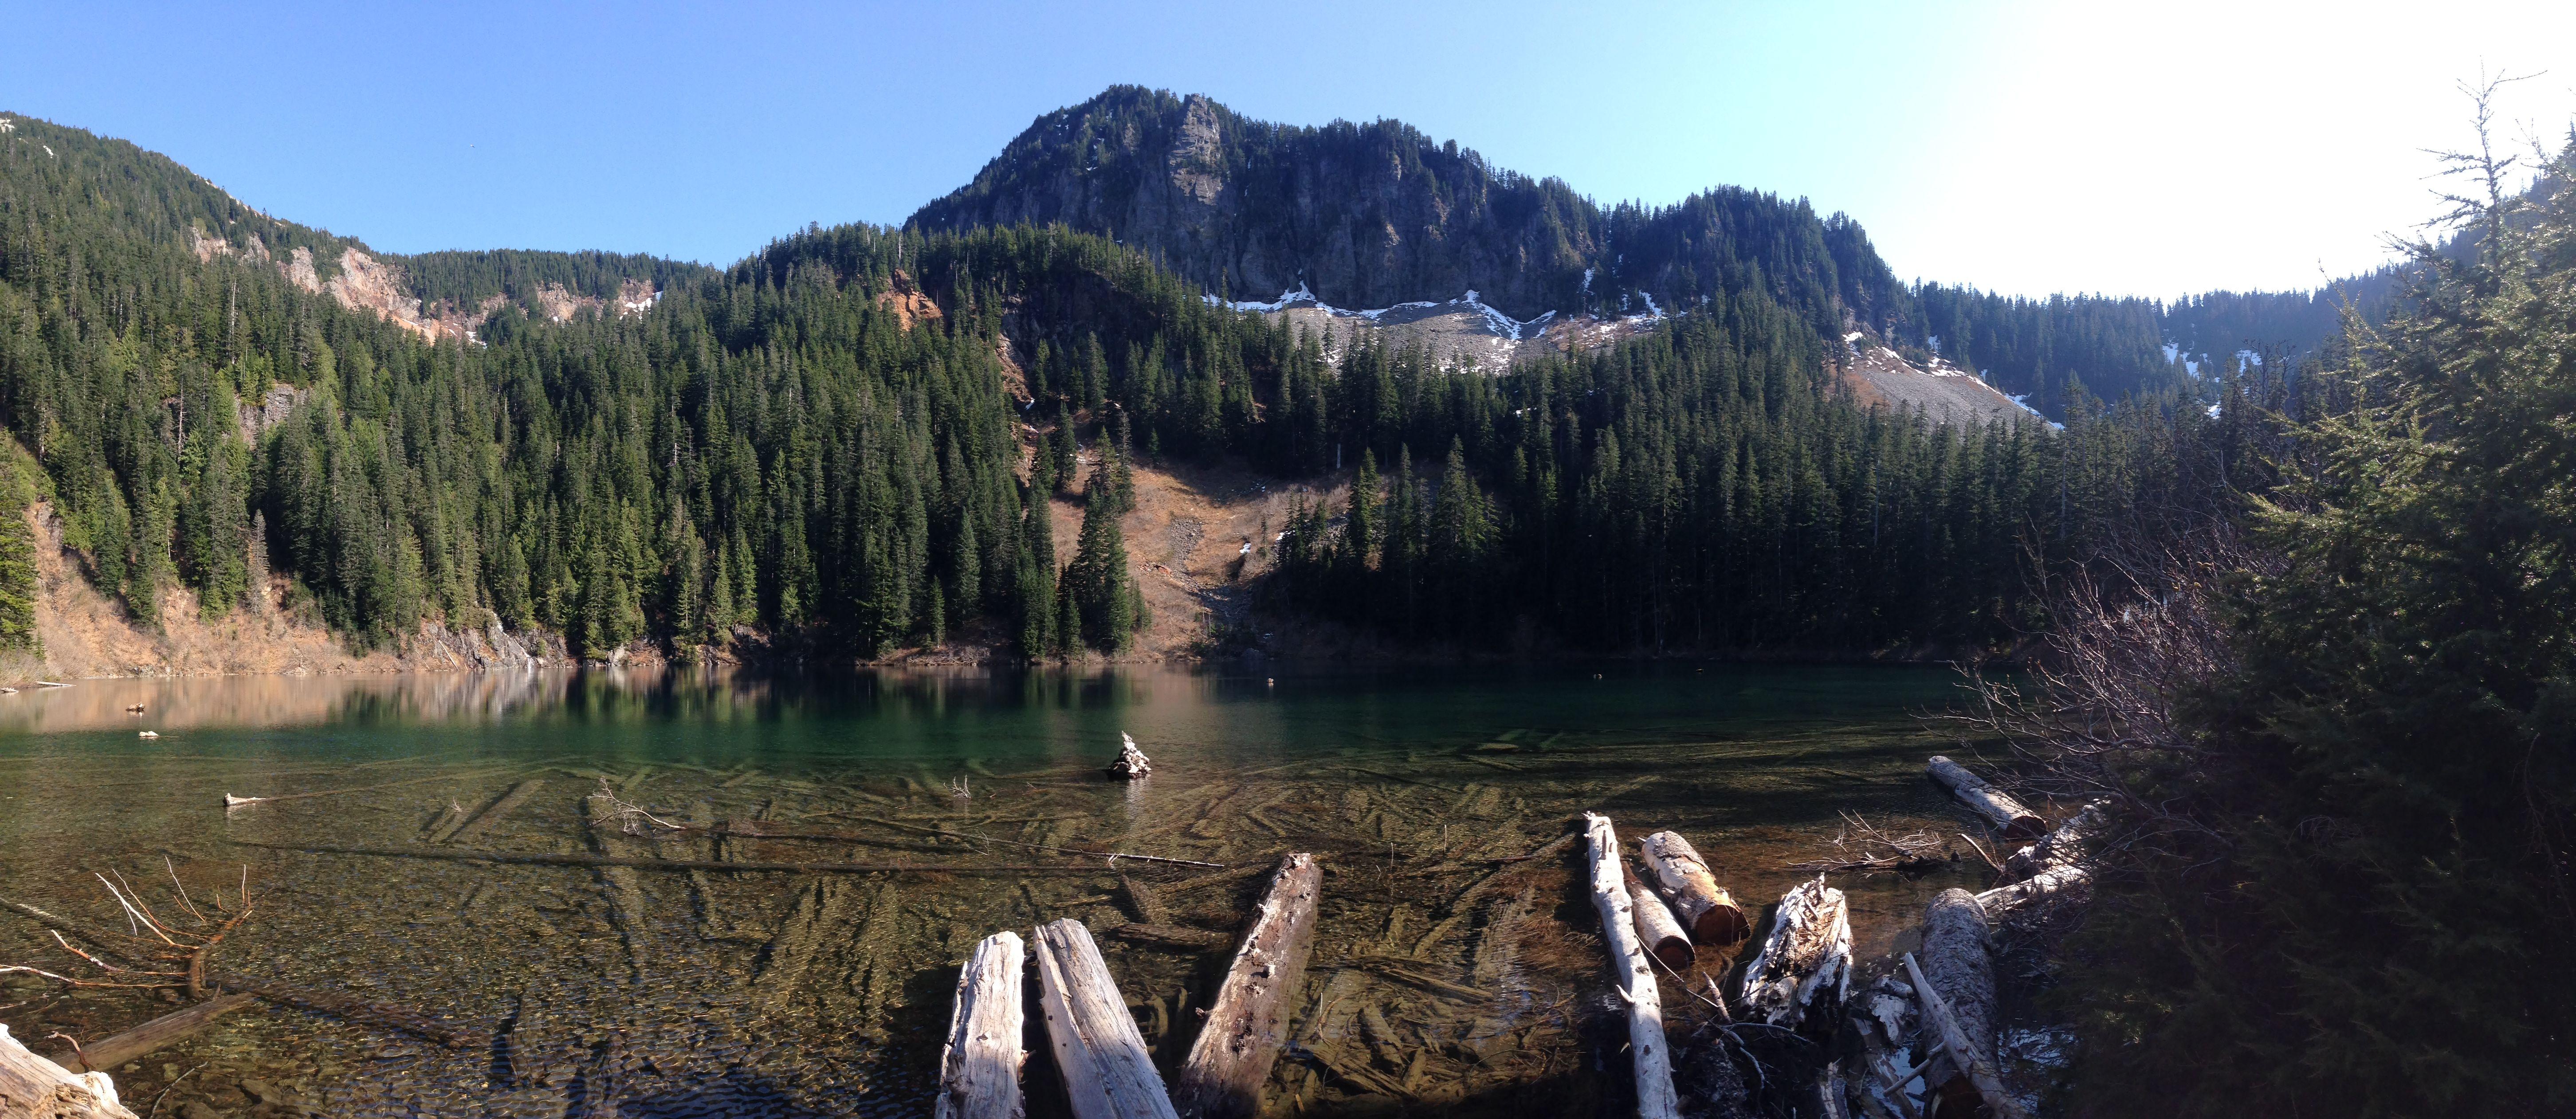 Annette Lake Snoqualmie Region -- Snoqualmie Pass 7.5 miles, roundtrip Gain: 1400 ft. Highest Point: 3600.0 ft.